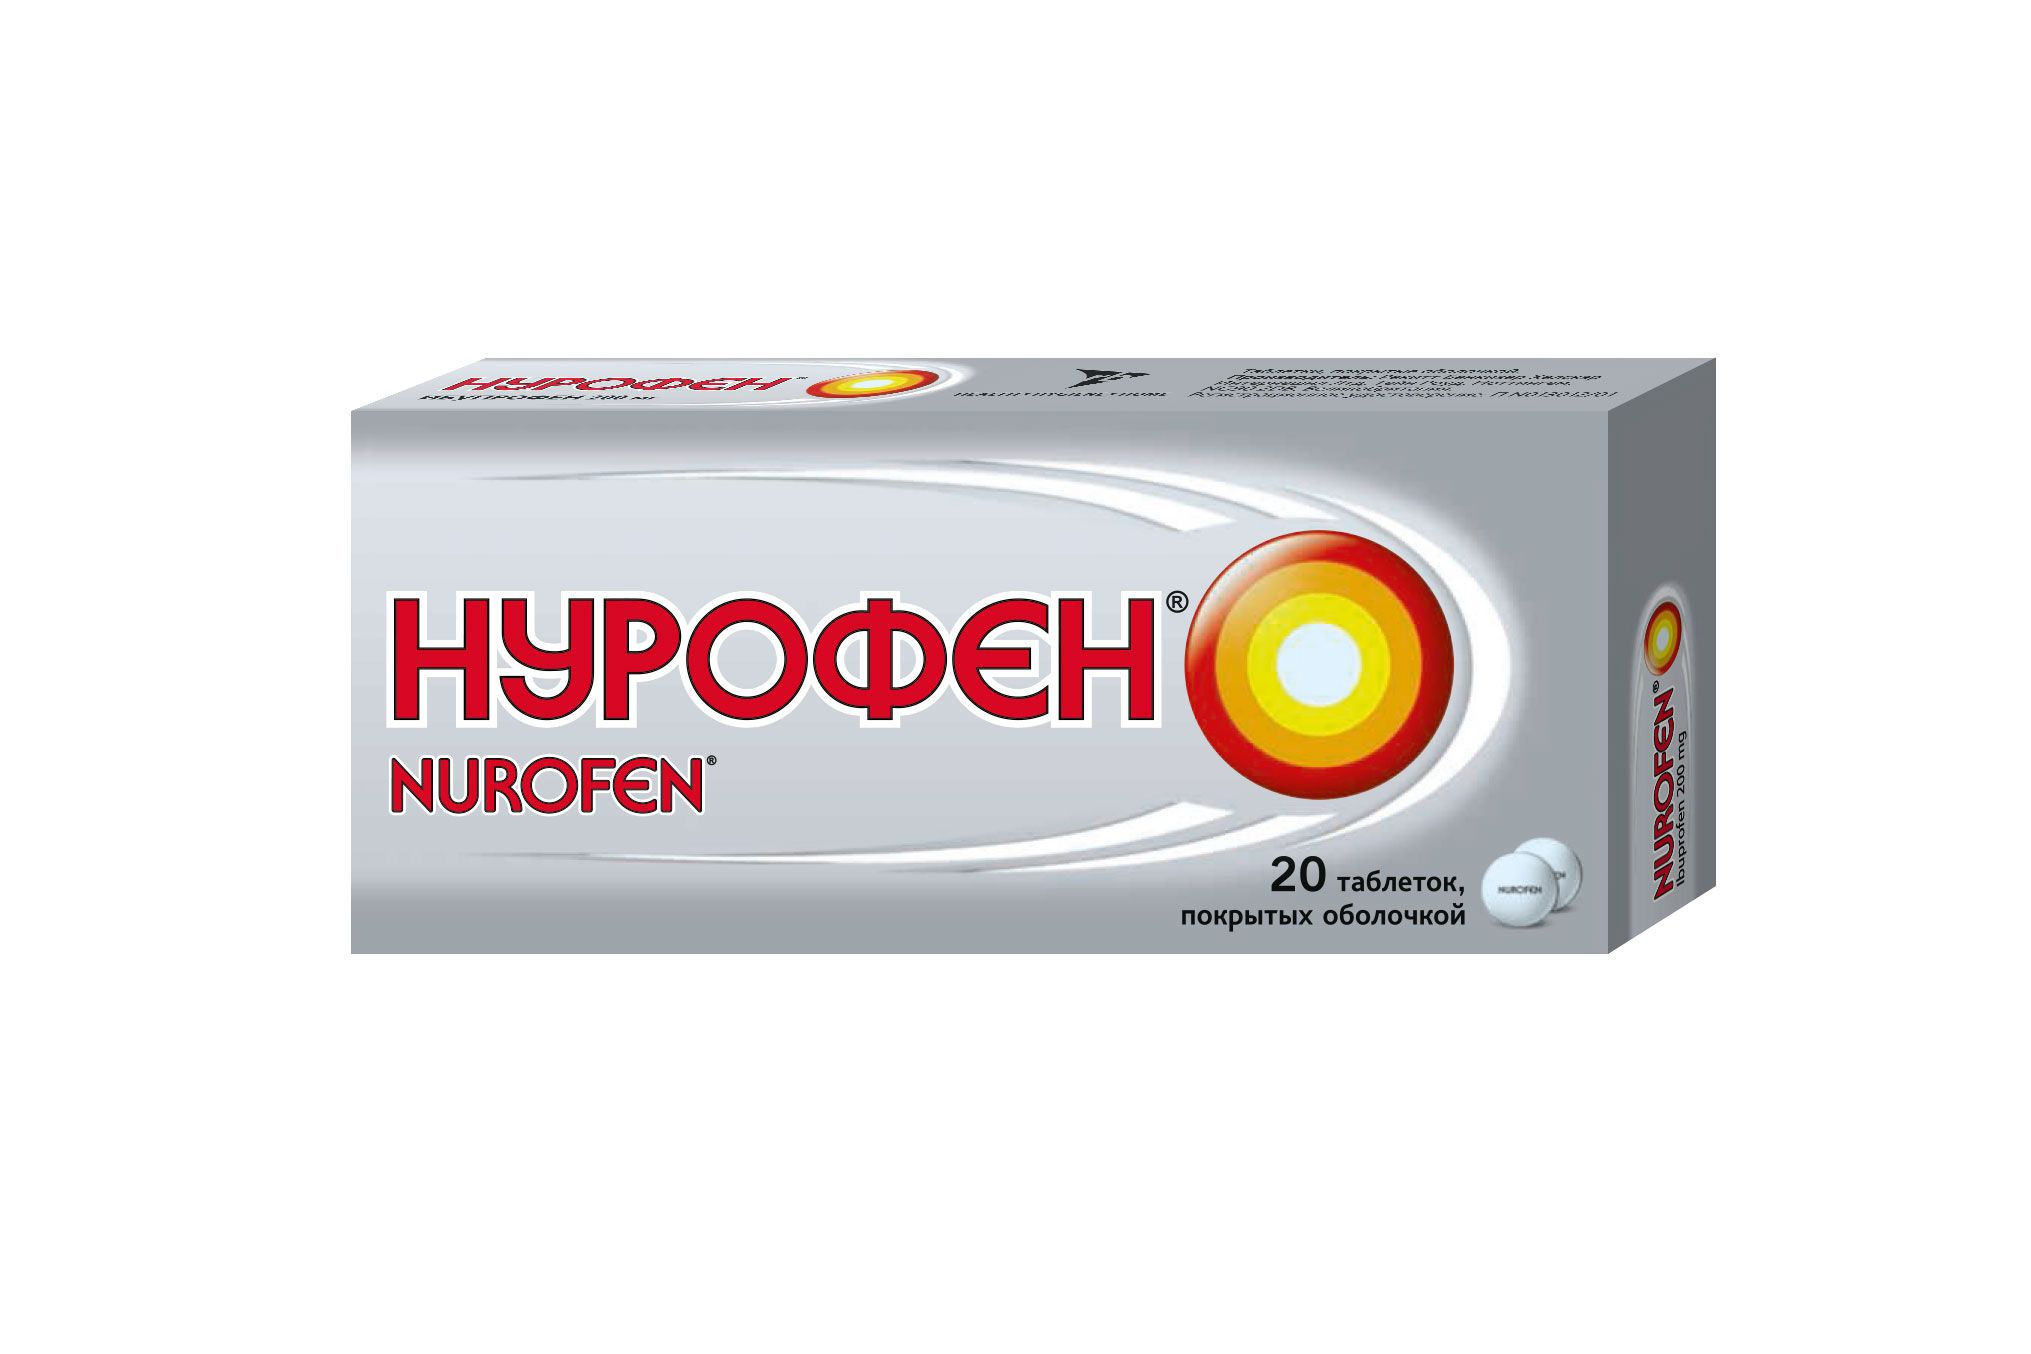 Нурофен 20 таблеток